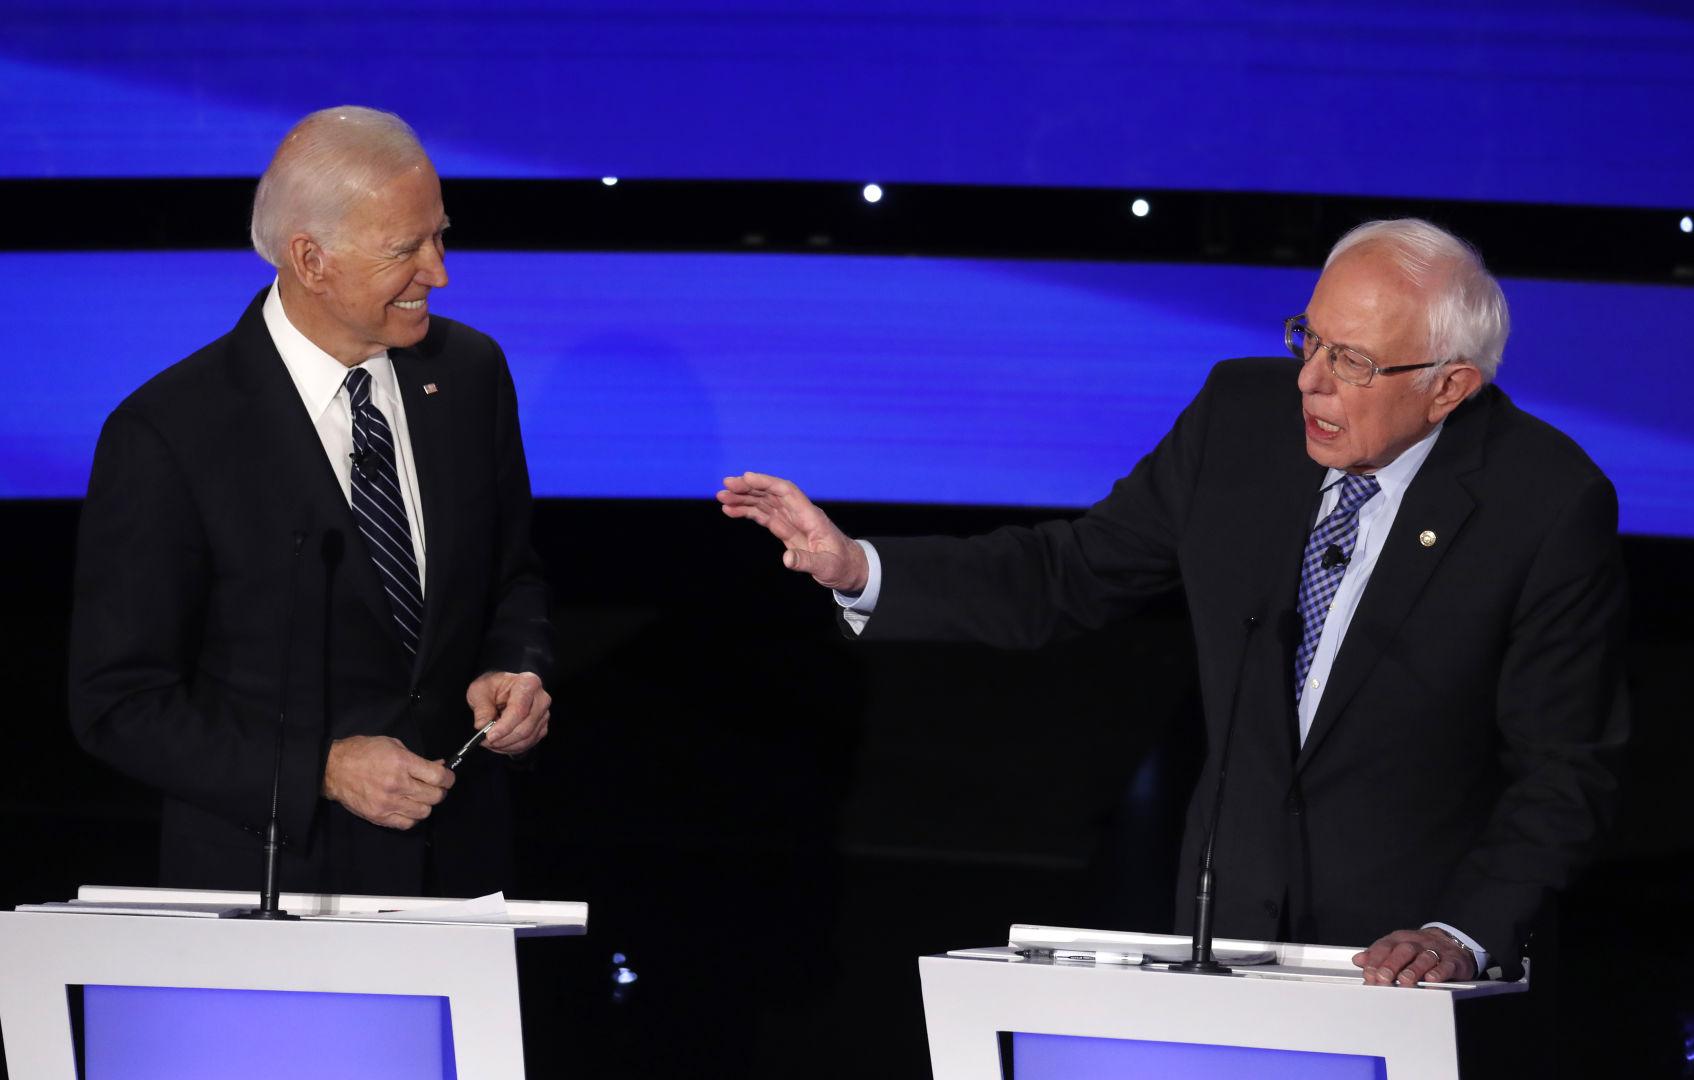 Joe Biden Led Budget Talks Where Social Security Cuts Were On The Table